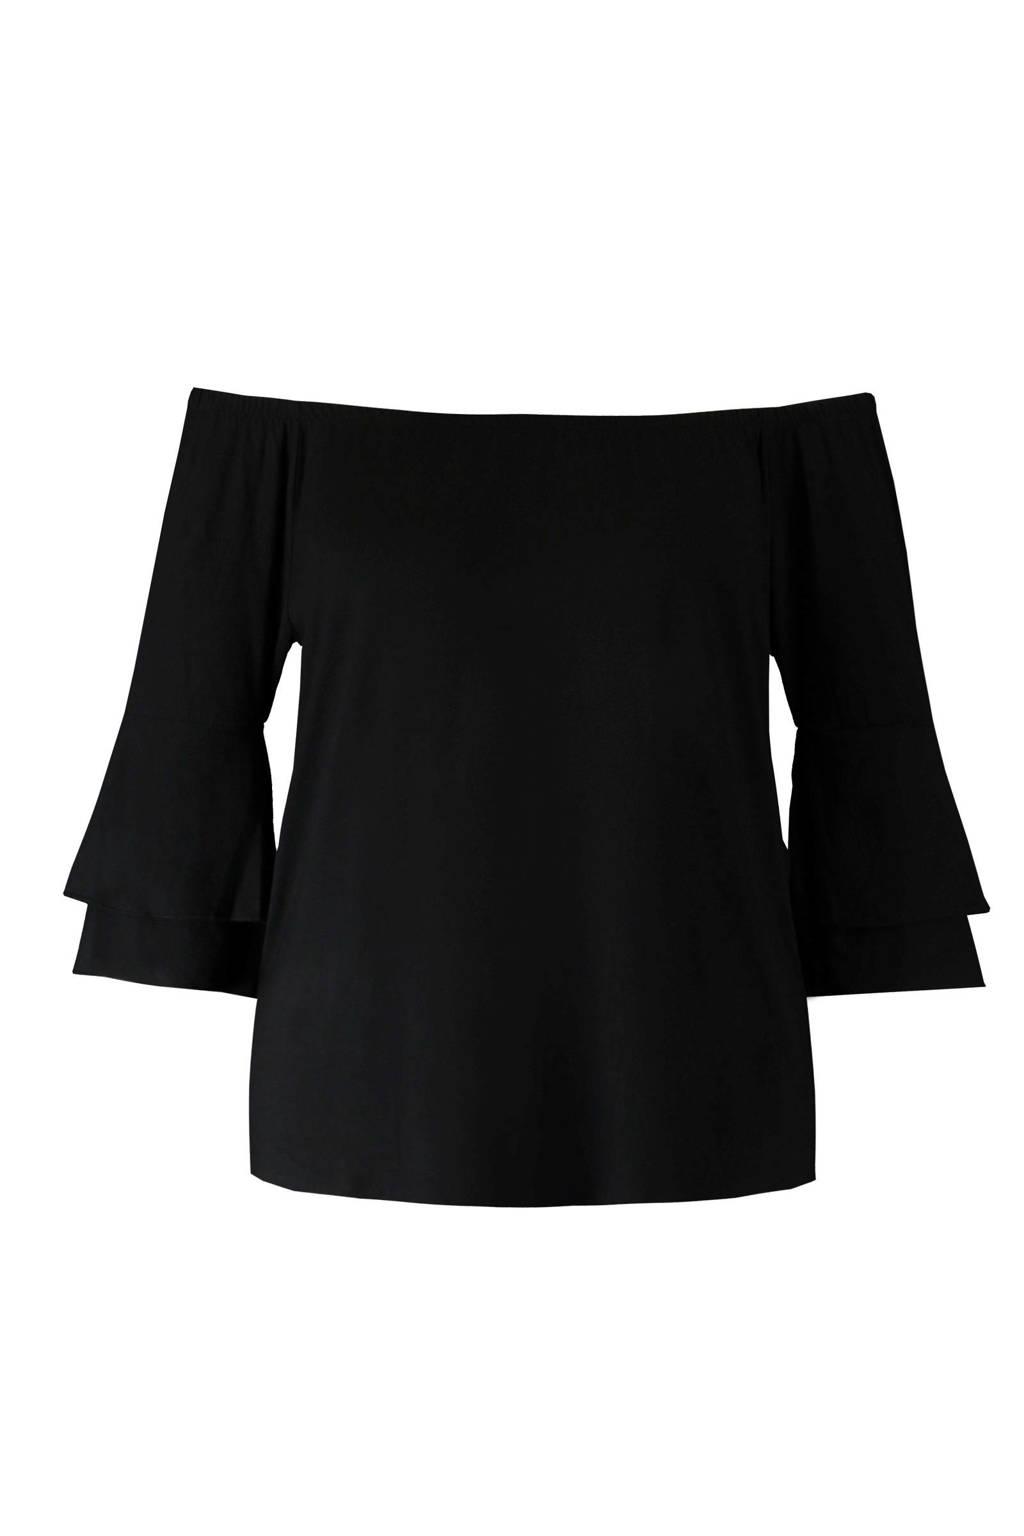 MS Mode off shoulder top zwart, Zwart